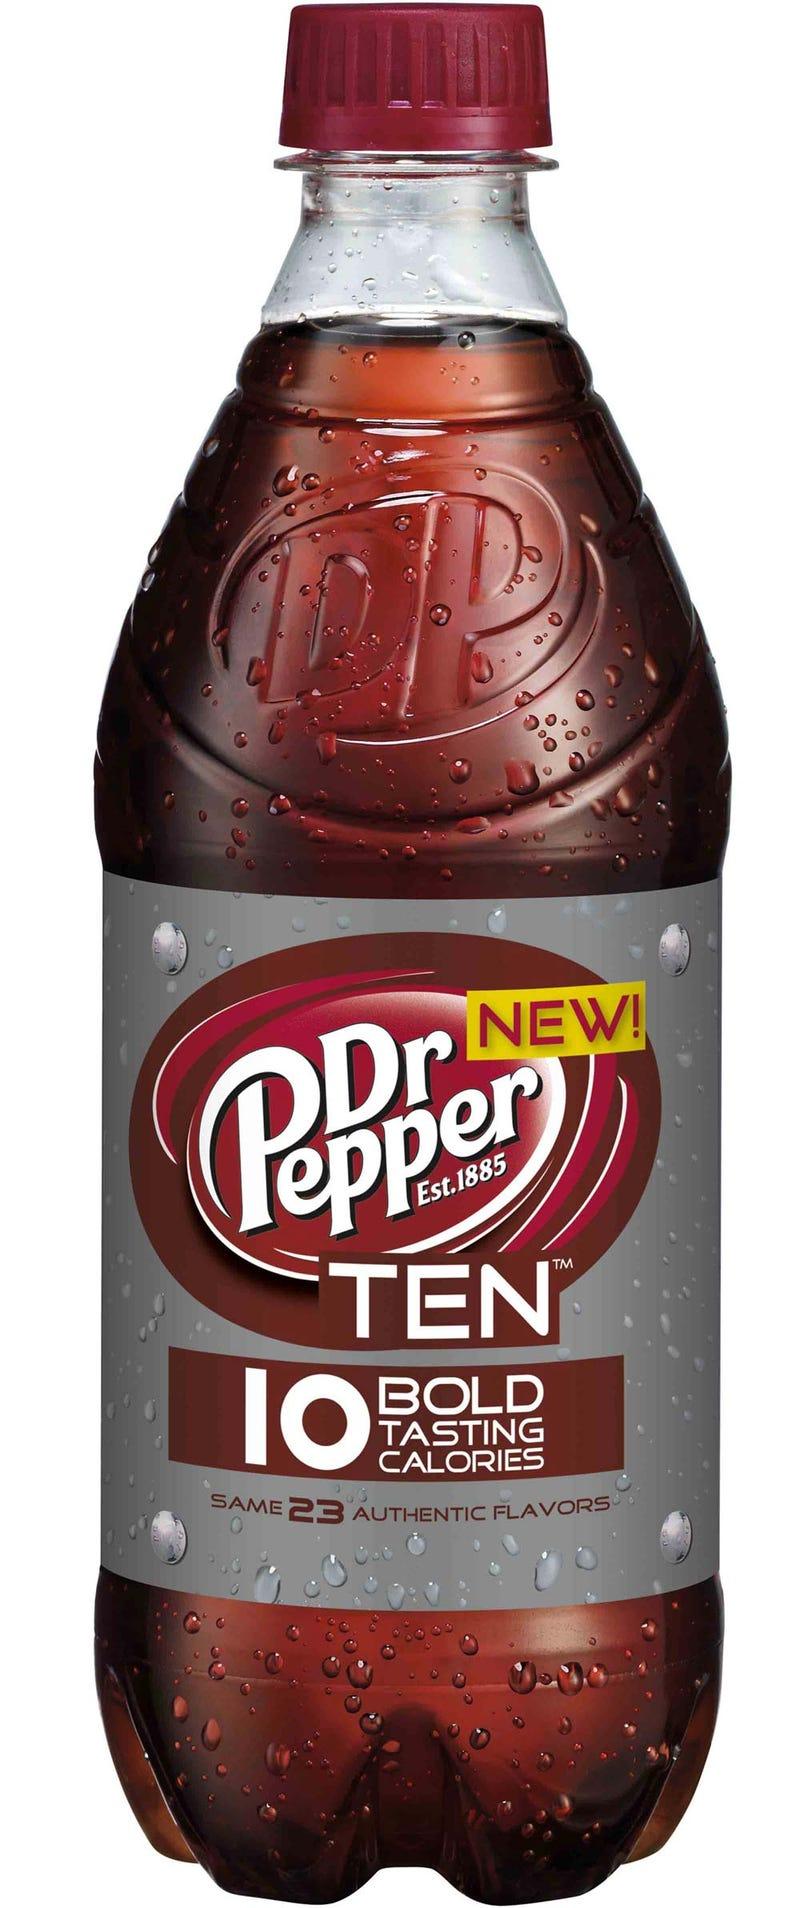 Illustration for article titled New Dr Pepper Drink Aimed At Men